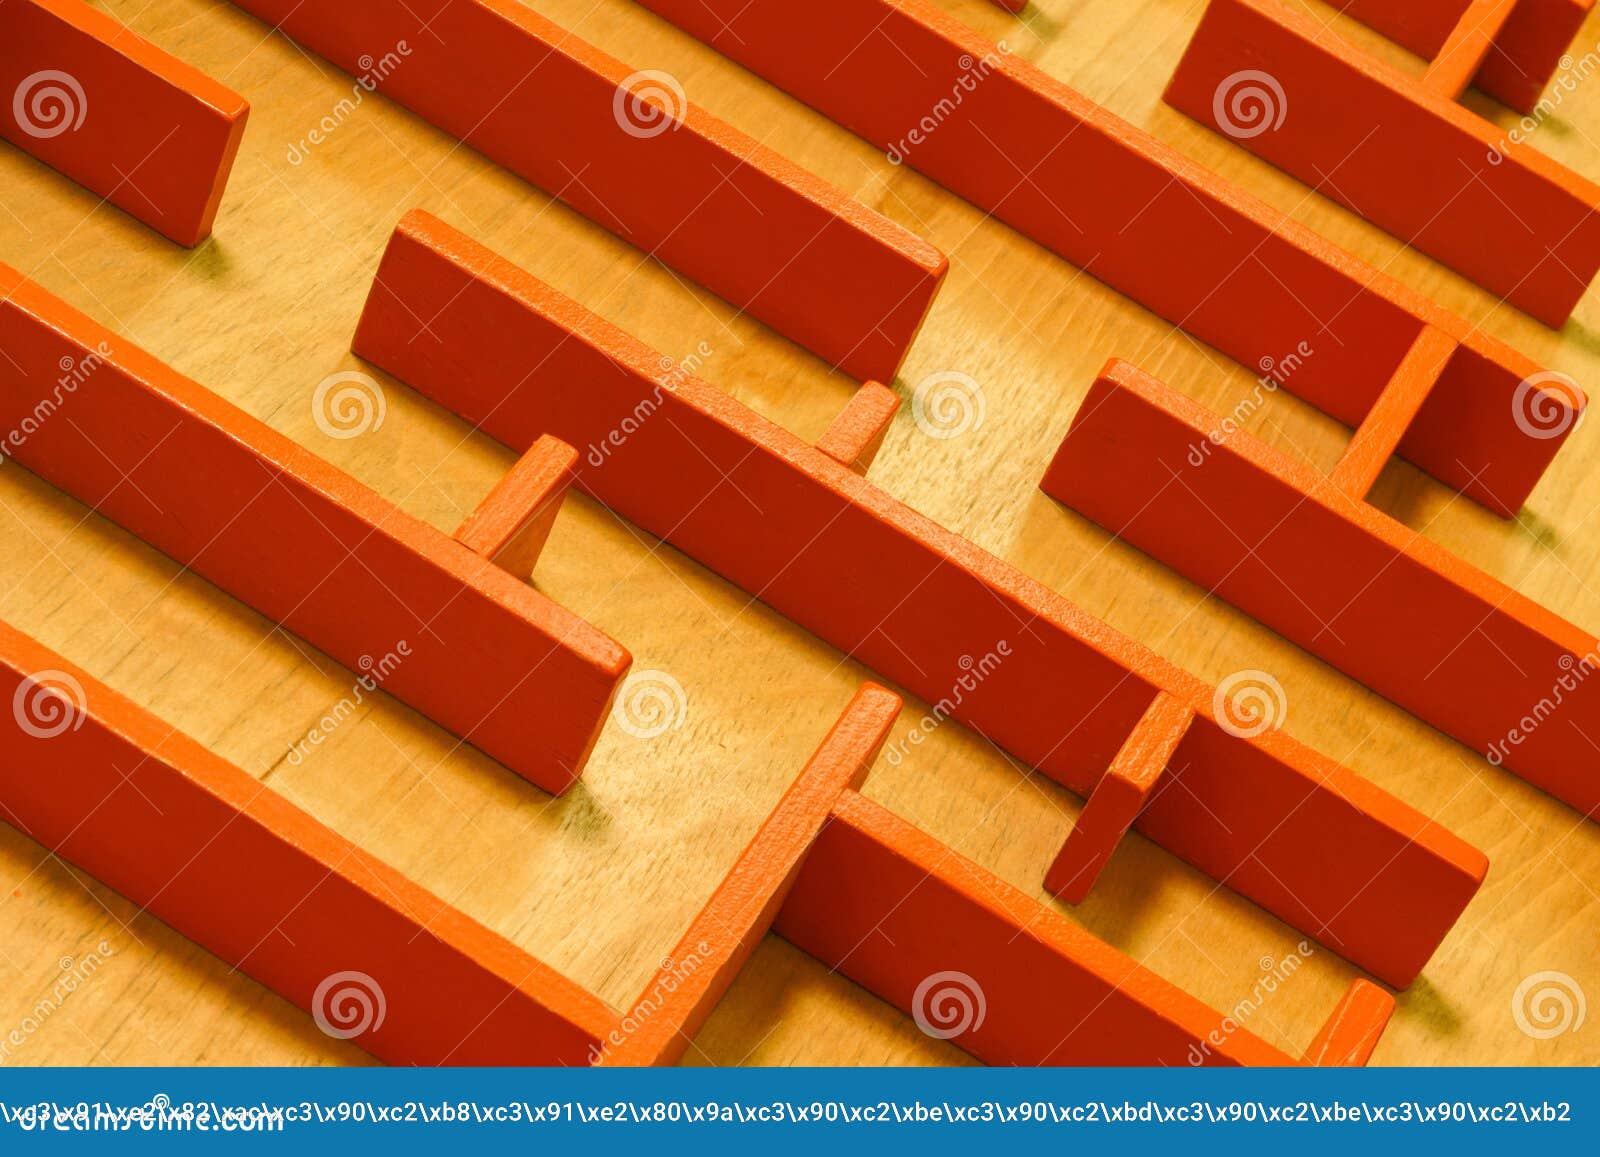 Achtergrond - een labyrint